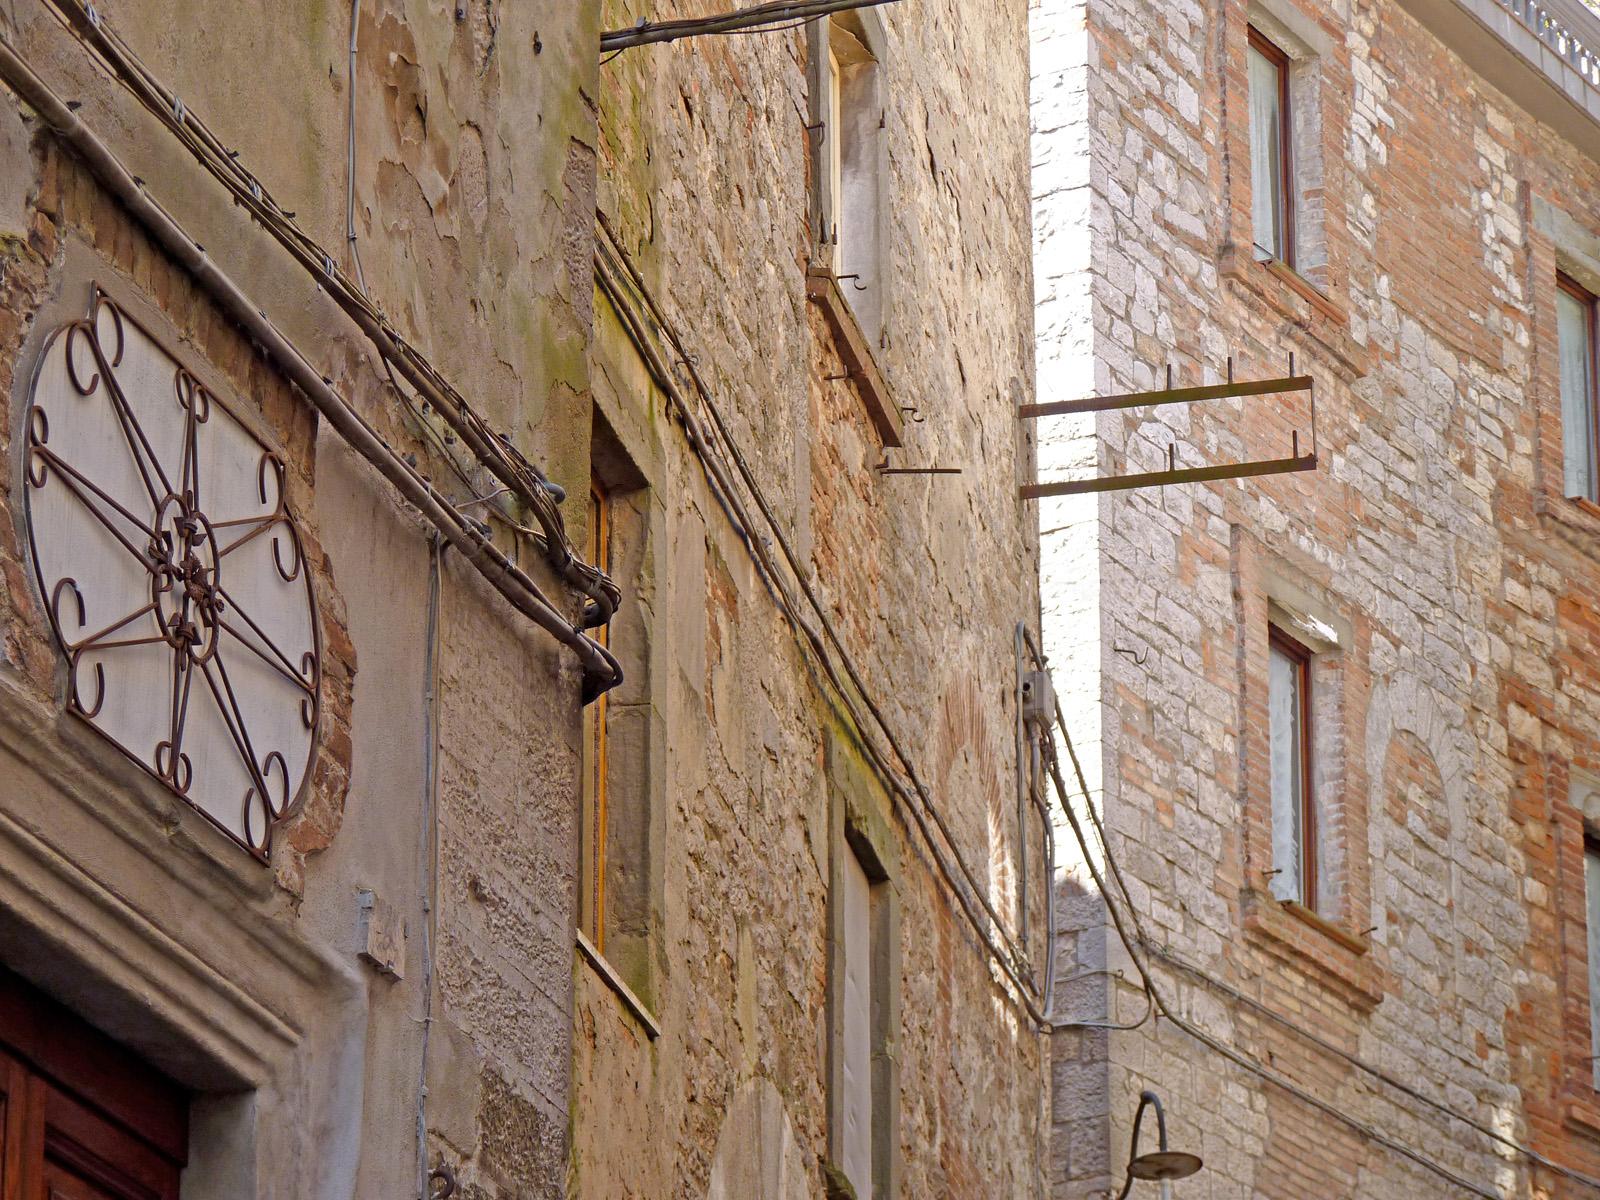 131 #WhereToGo: Todi